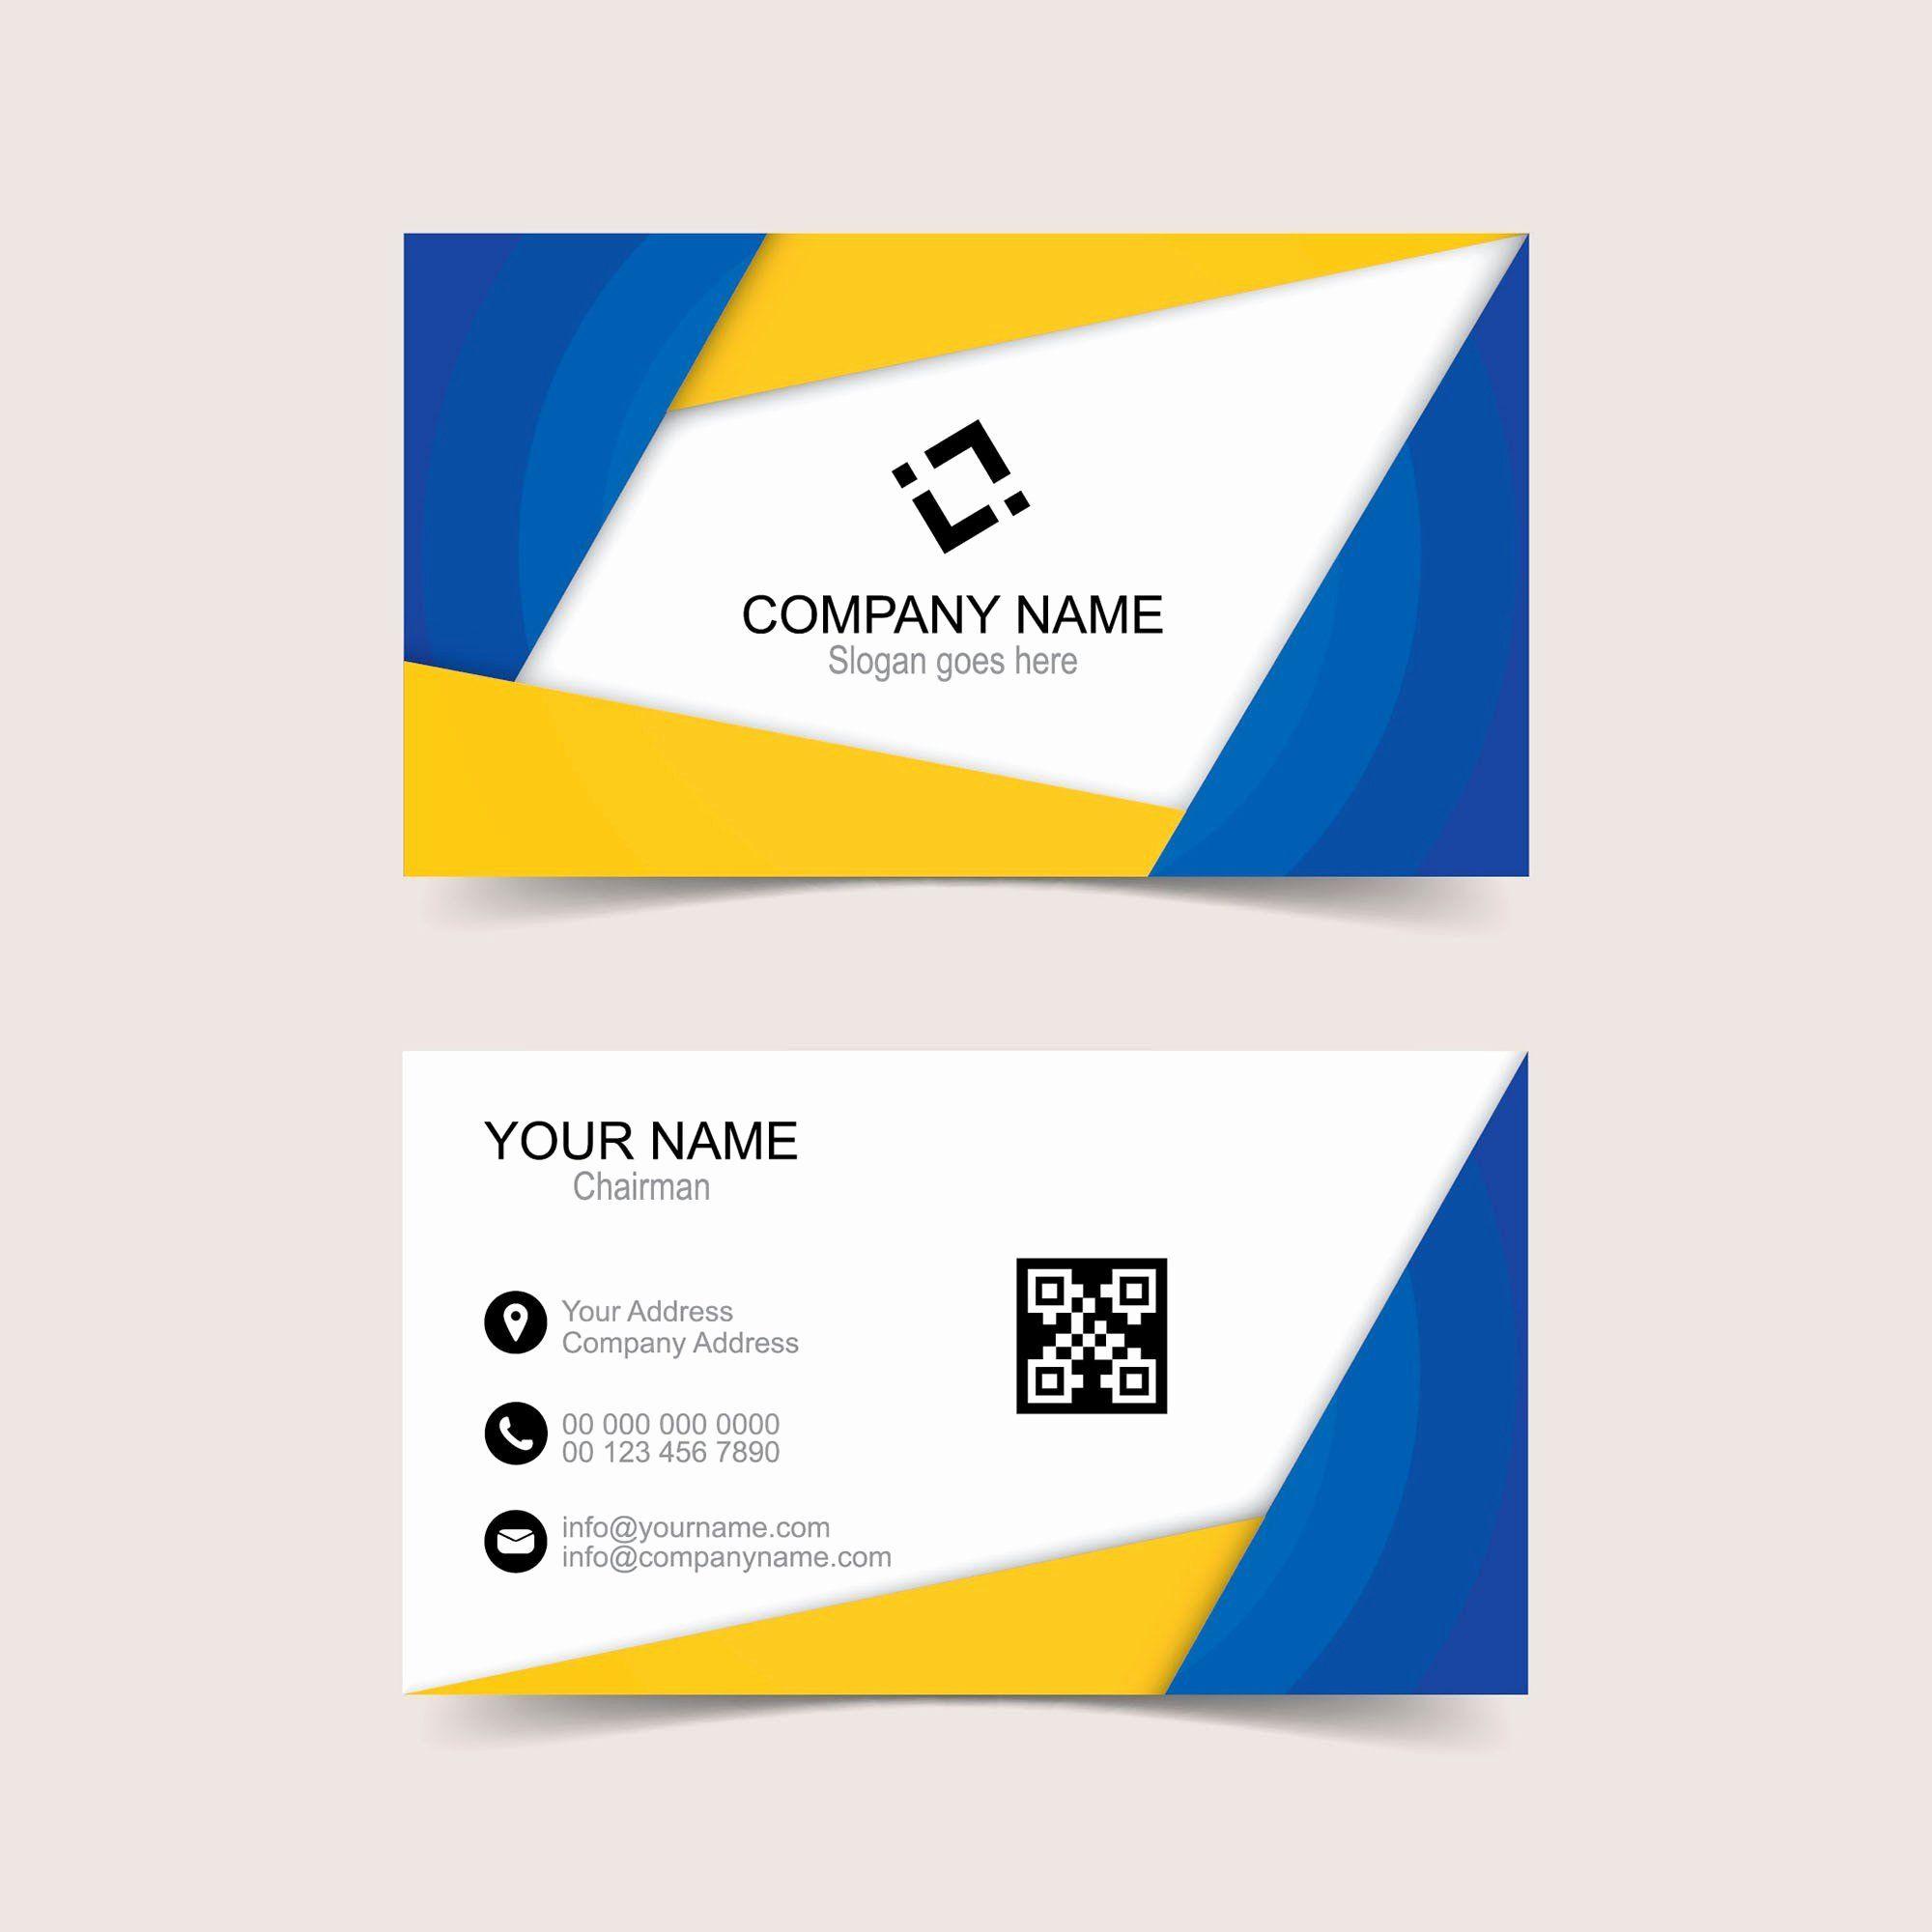 Powerpoint Business Card Template Fresh Christian Business Cards Beautiful 12new Business Card Template Printable Business Cards Business Card Template Design